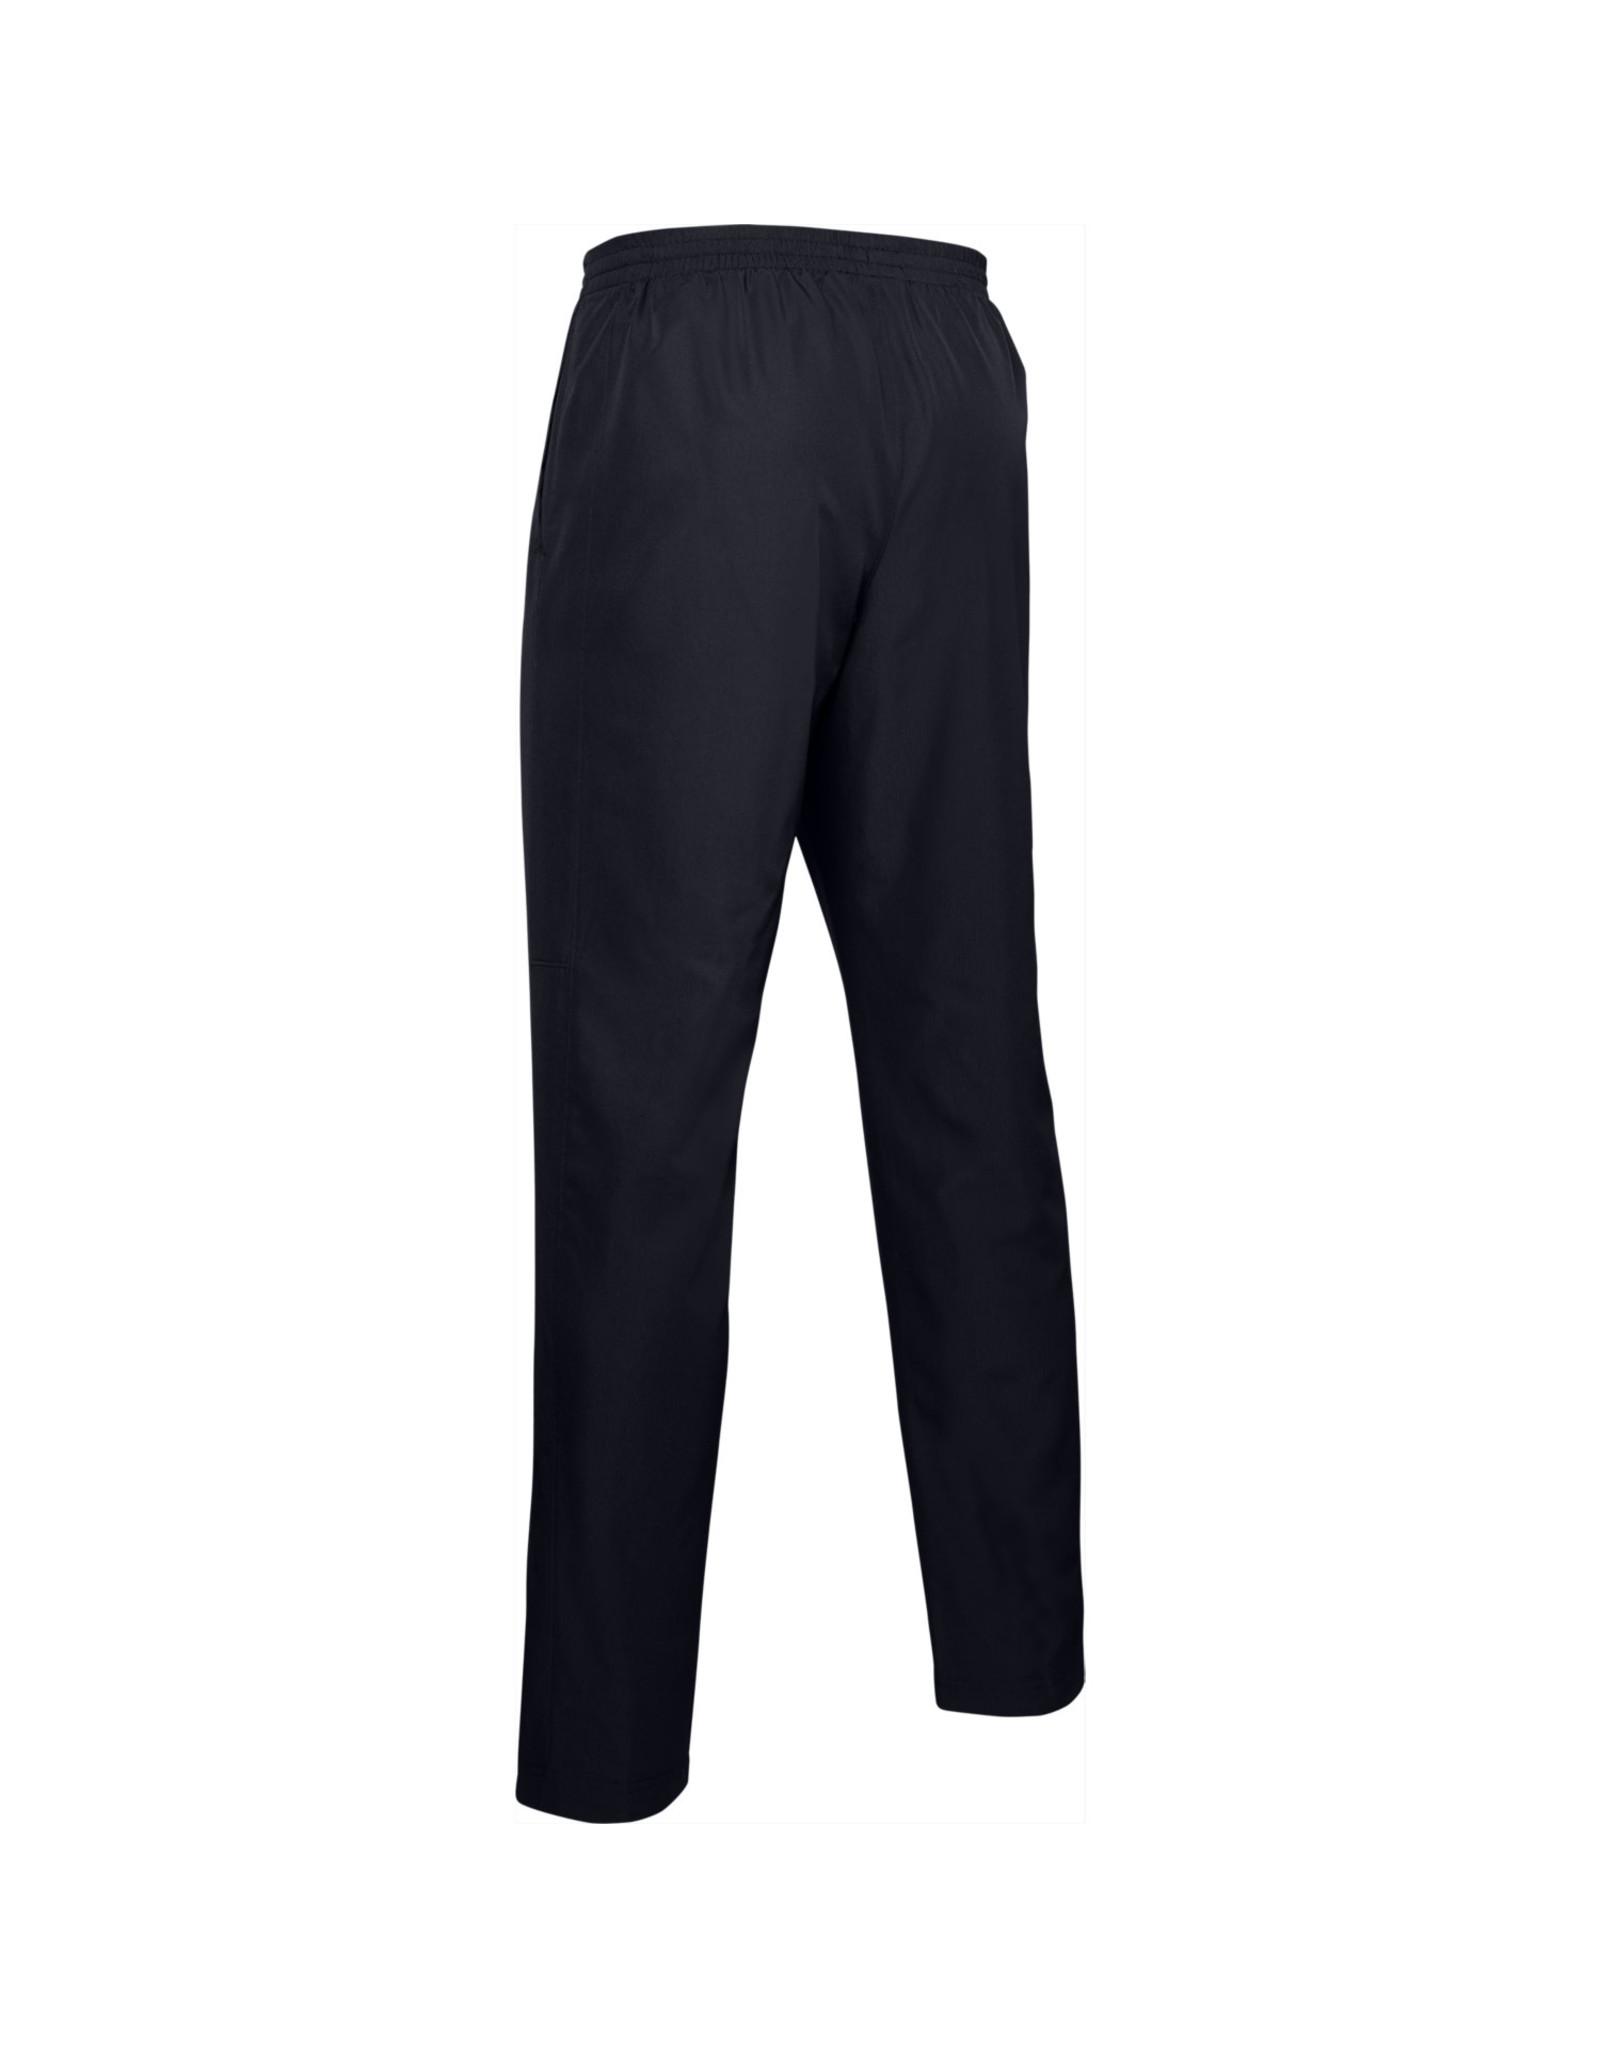 Under Armour UA VITAL Woven Pants-BLK